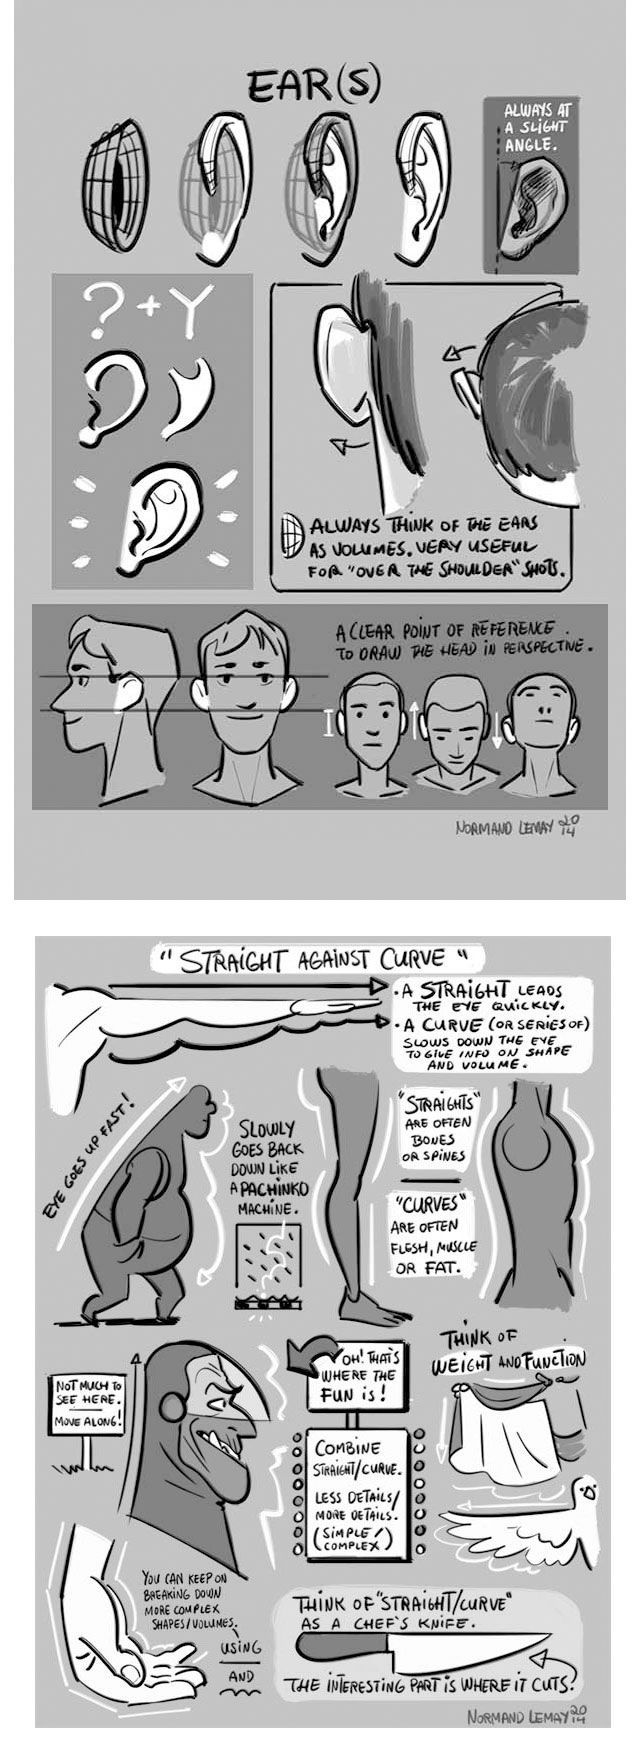 griselda_drawing_tips_7: